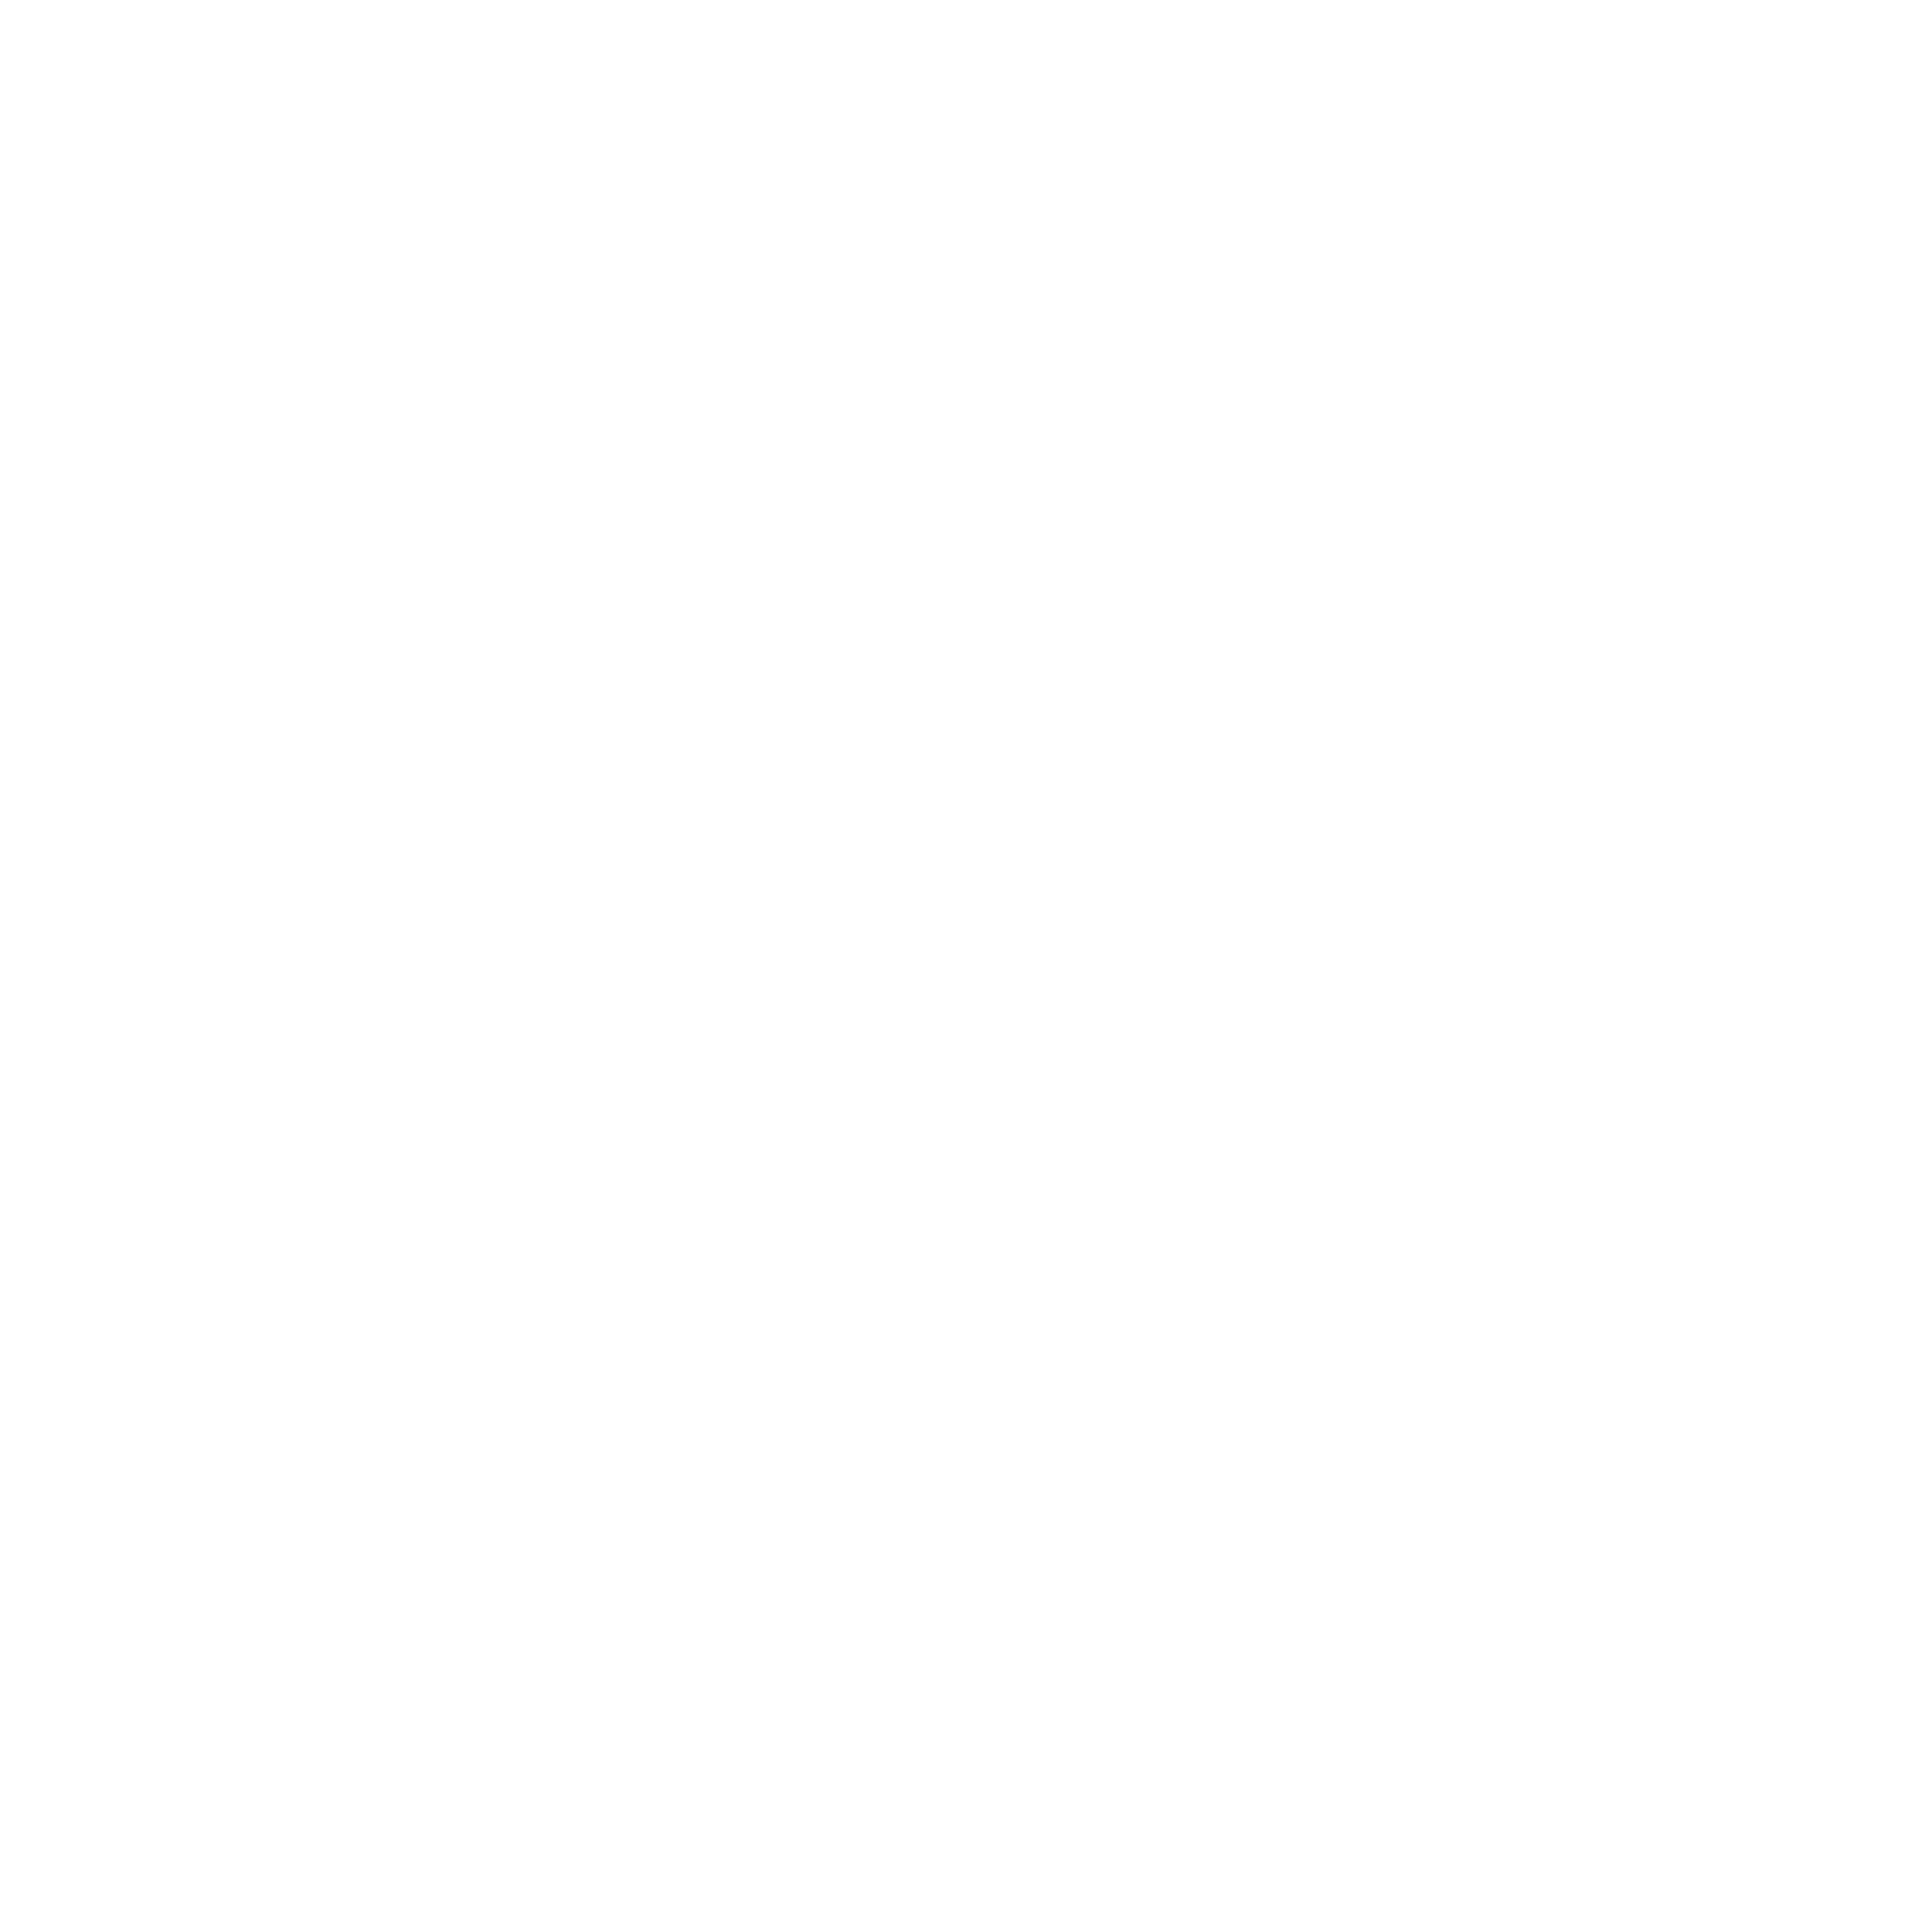 platform explanation